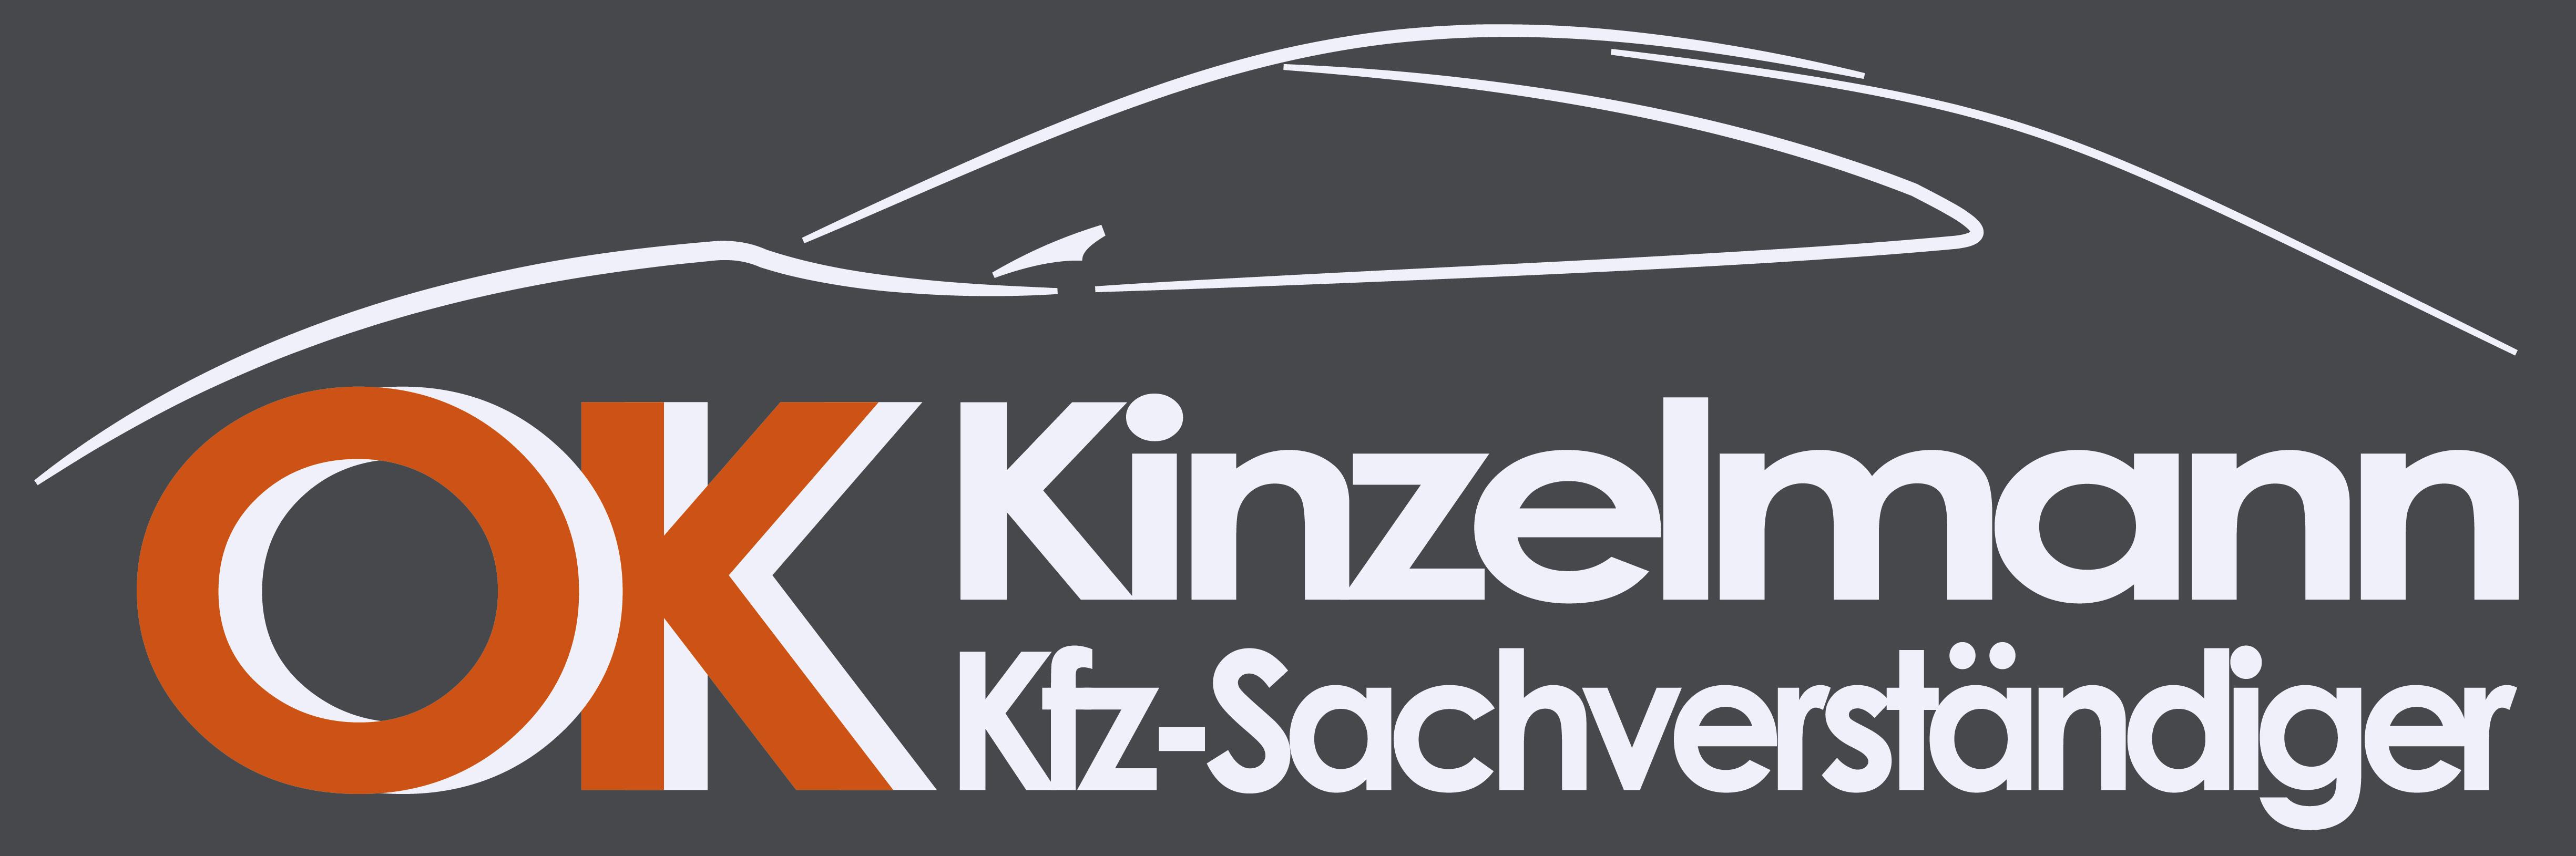 Kfz-Sachverständiger Kinzelmann